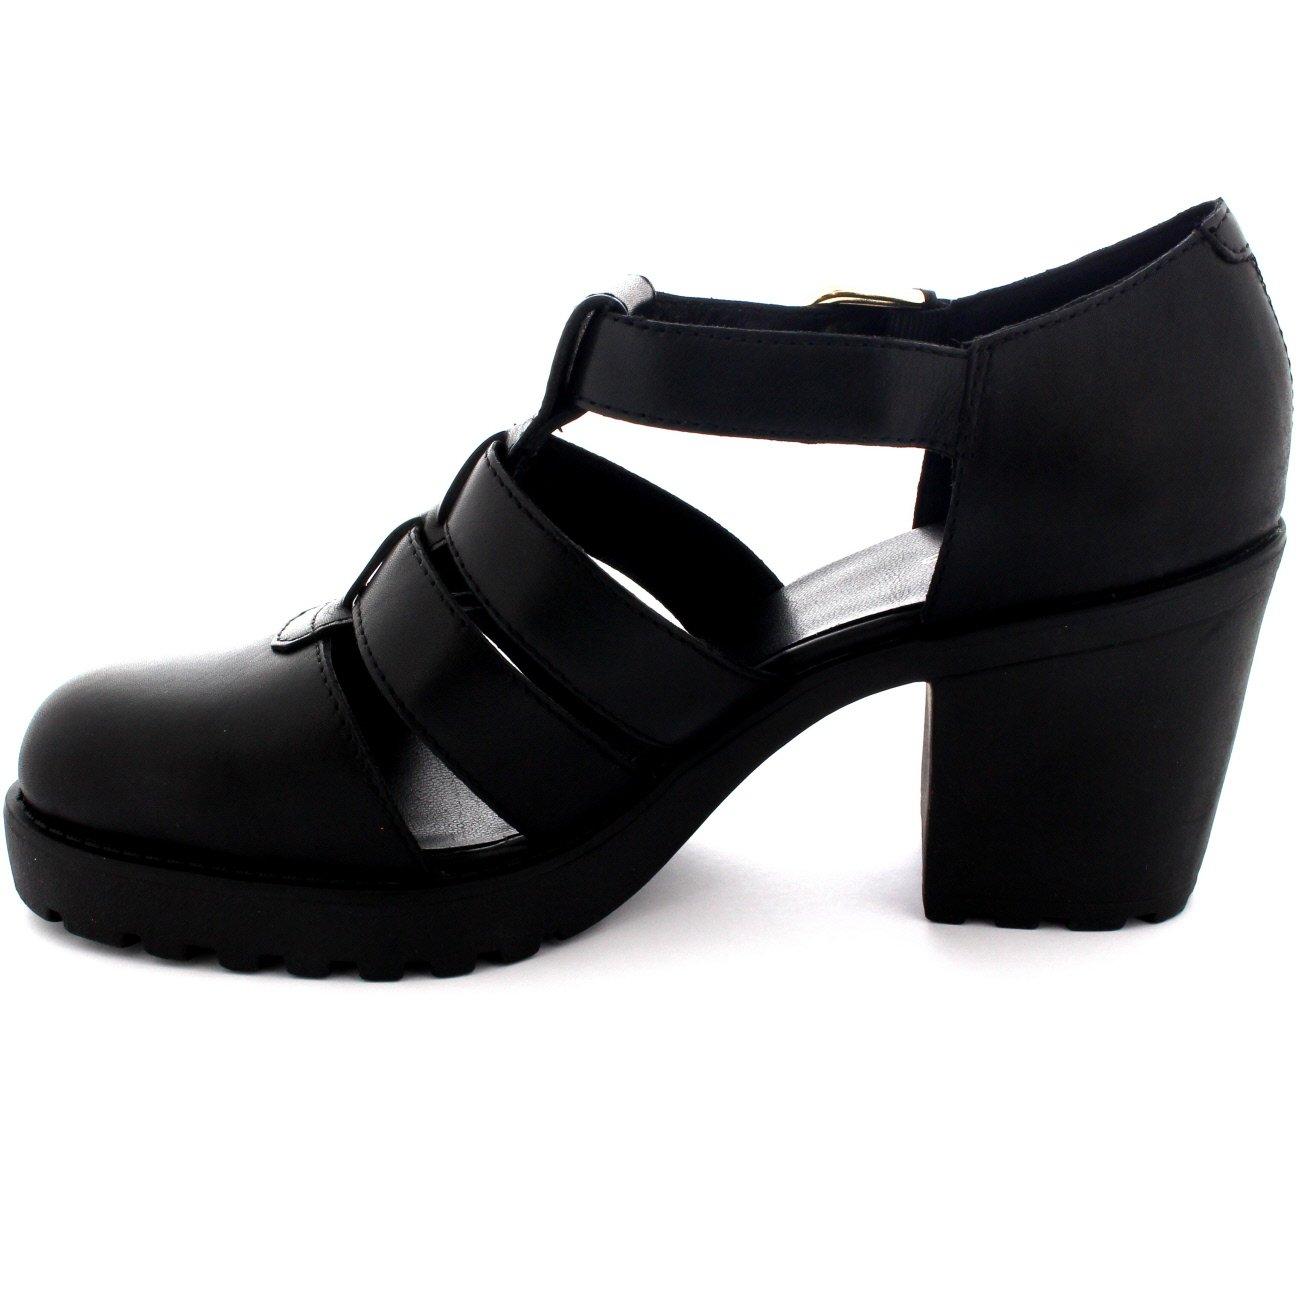 Vagabond Damen Grace Schnalle Festival Mittel Ferse Stiefel Sandalen - Weiß  - 42  Amazon.de  Schuhe   Handtaschen 6f19bca63a